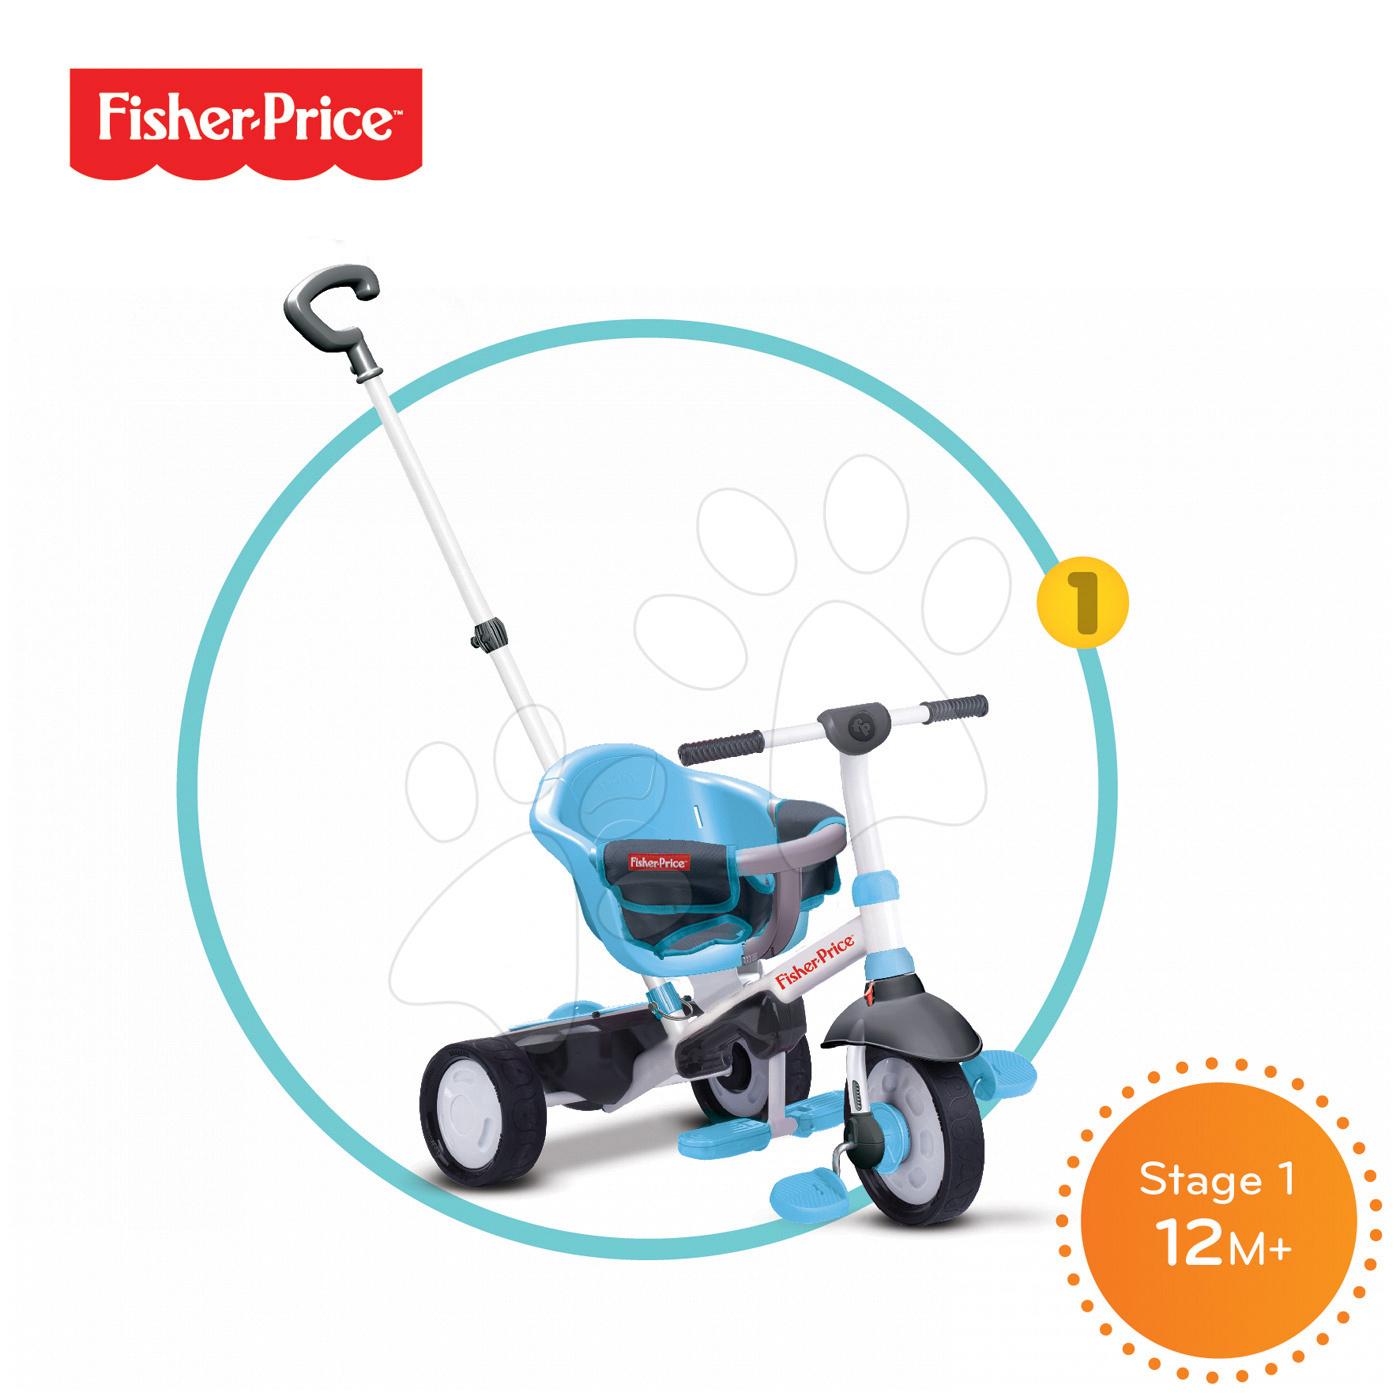 Trojkolky od 10 mesiacov - Trojkolka Fisher-Price Charm Touch Steering smarTrike modrá od 12 mes